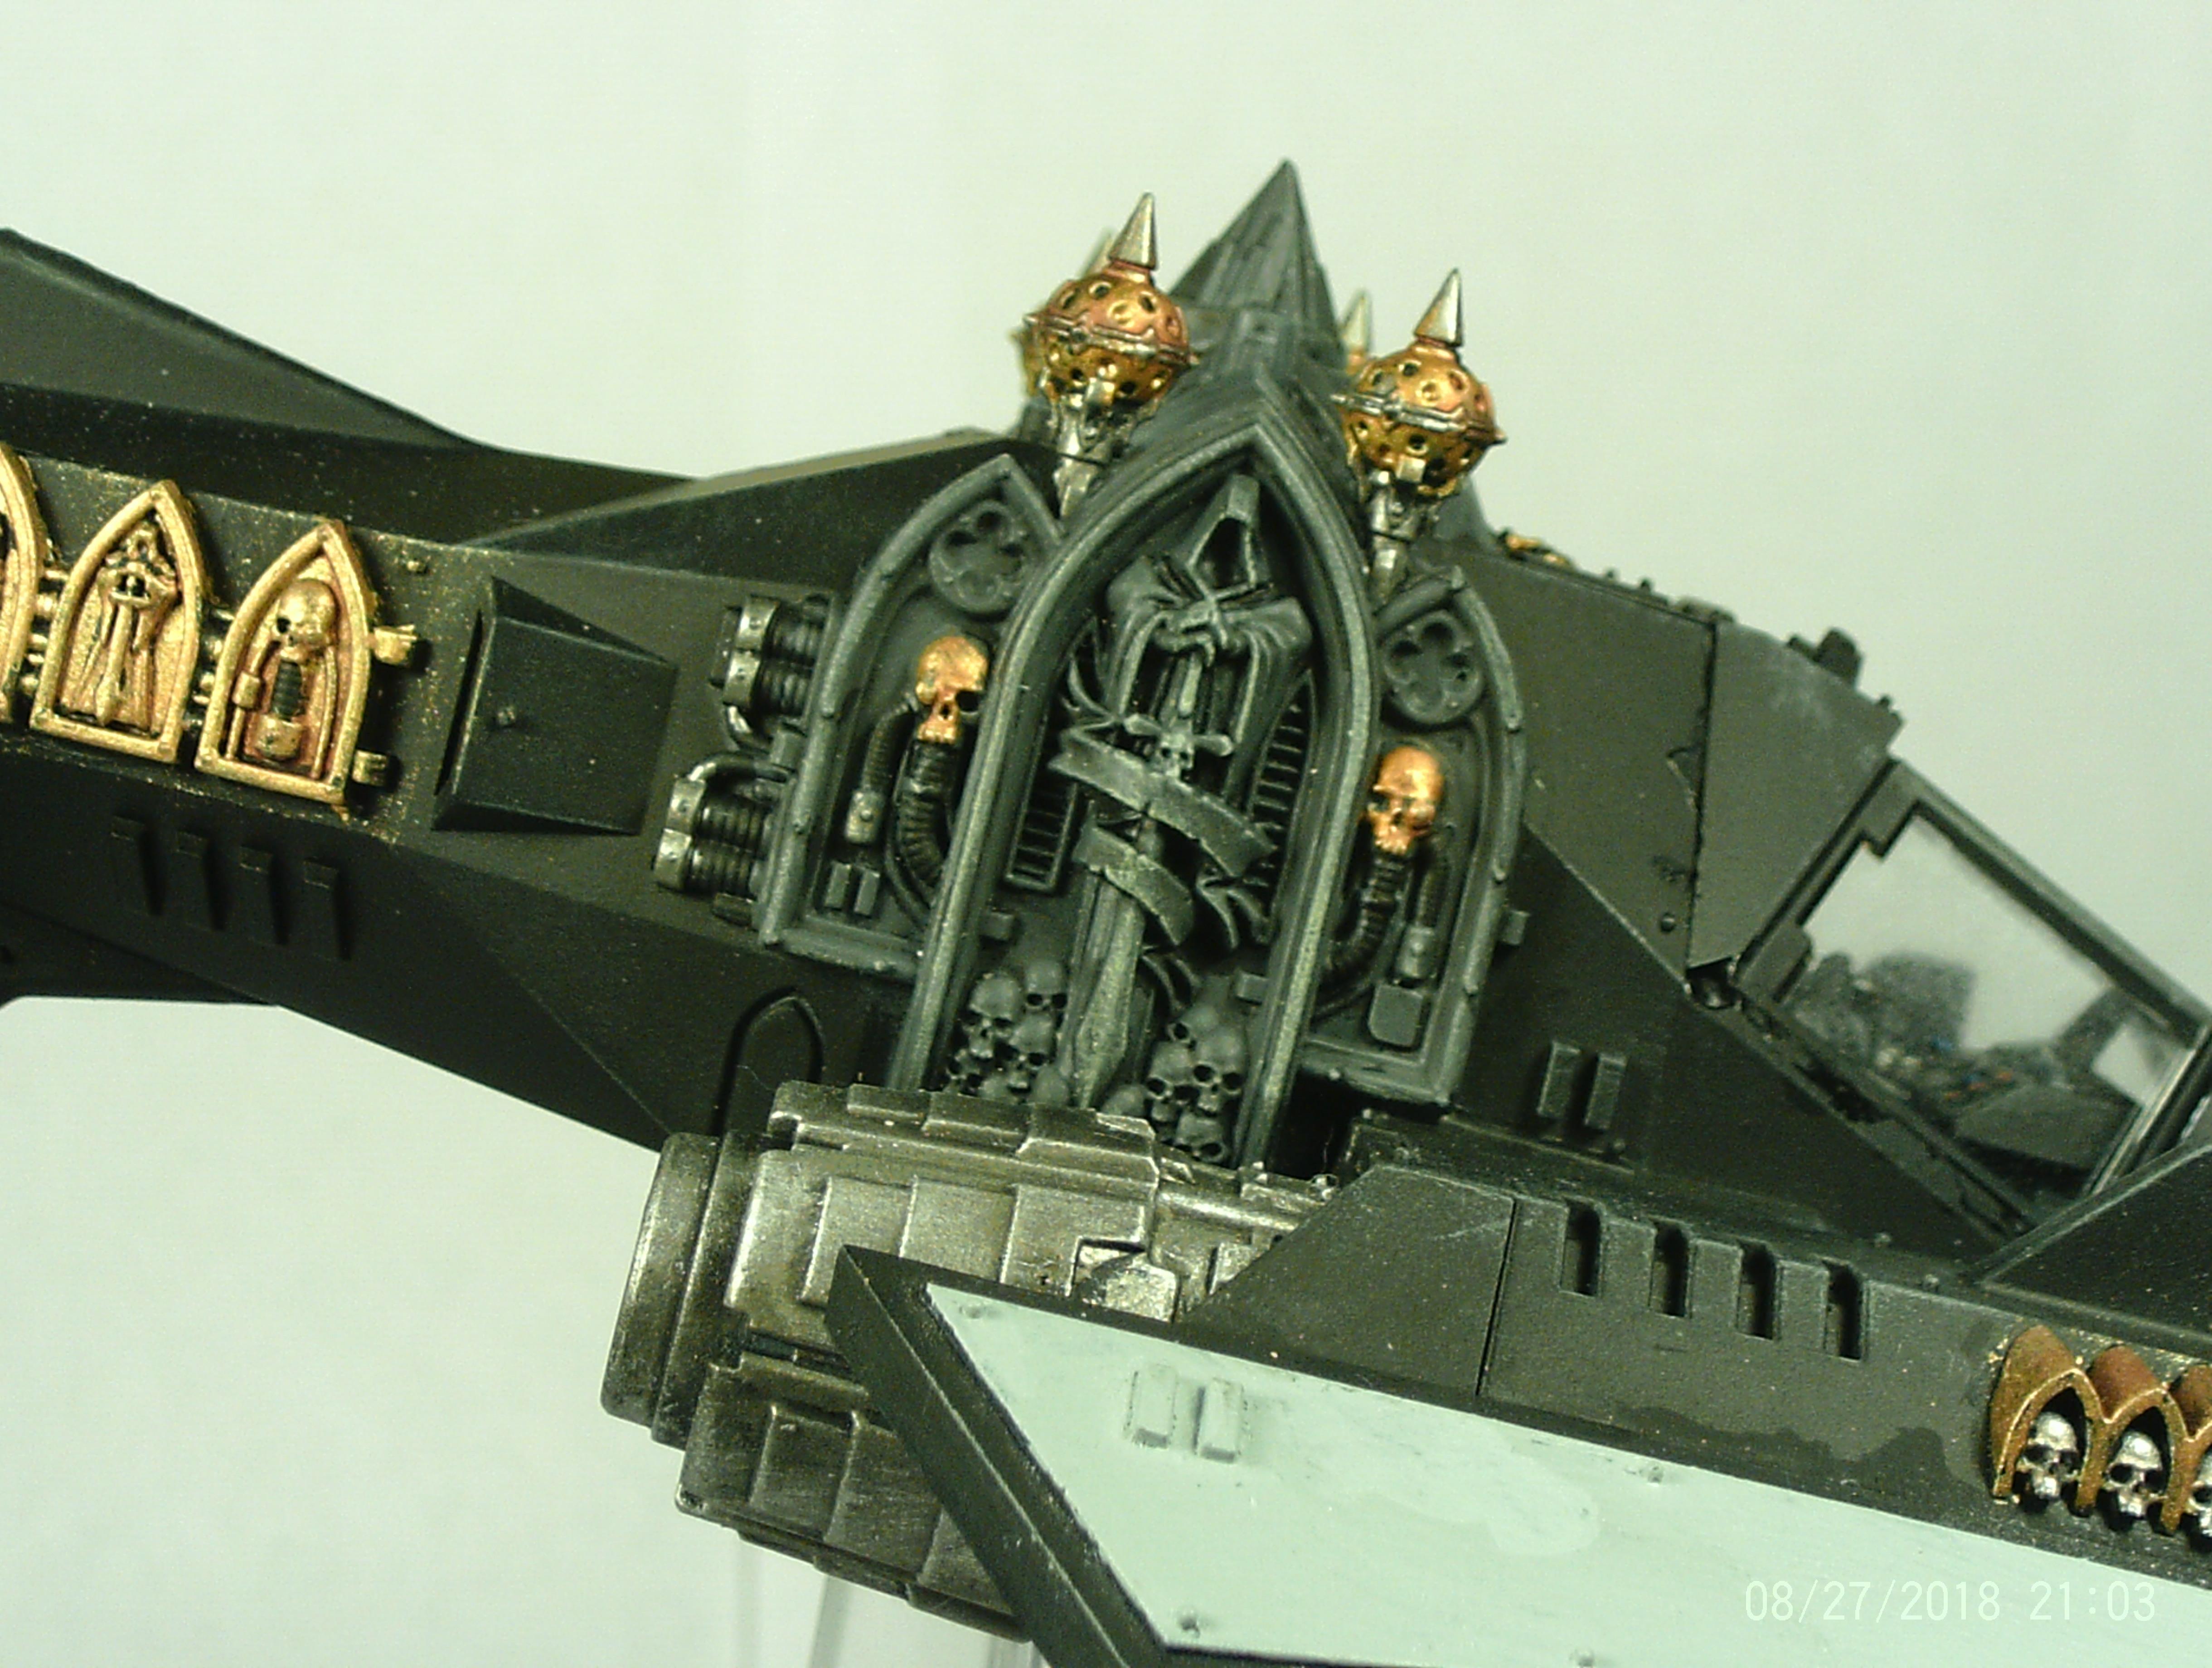 Angel, Bomber, Dark, Flyer, Plane, Ravenwing, Space, Space Marines, Stasis, Talon